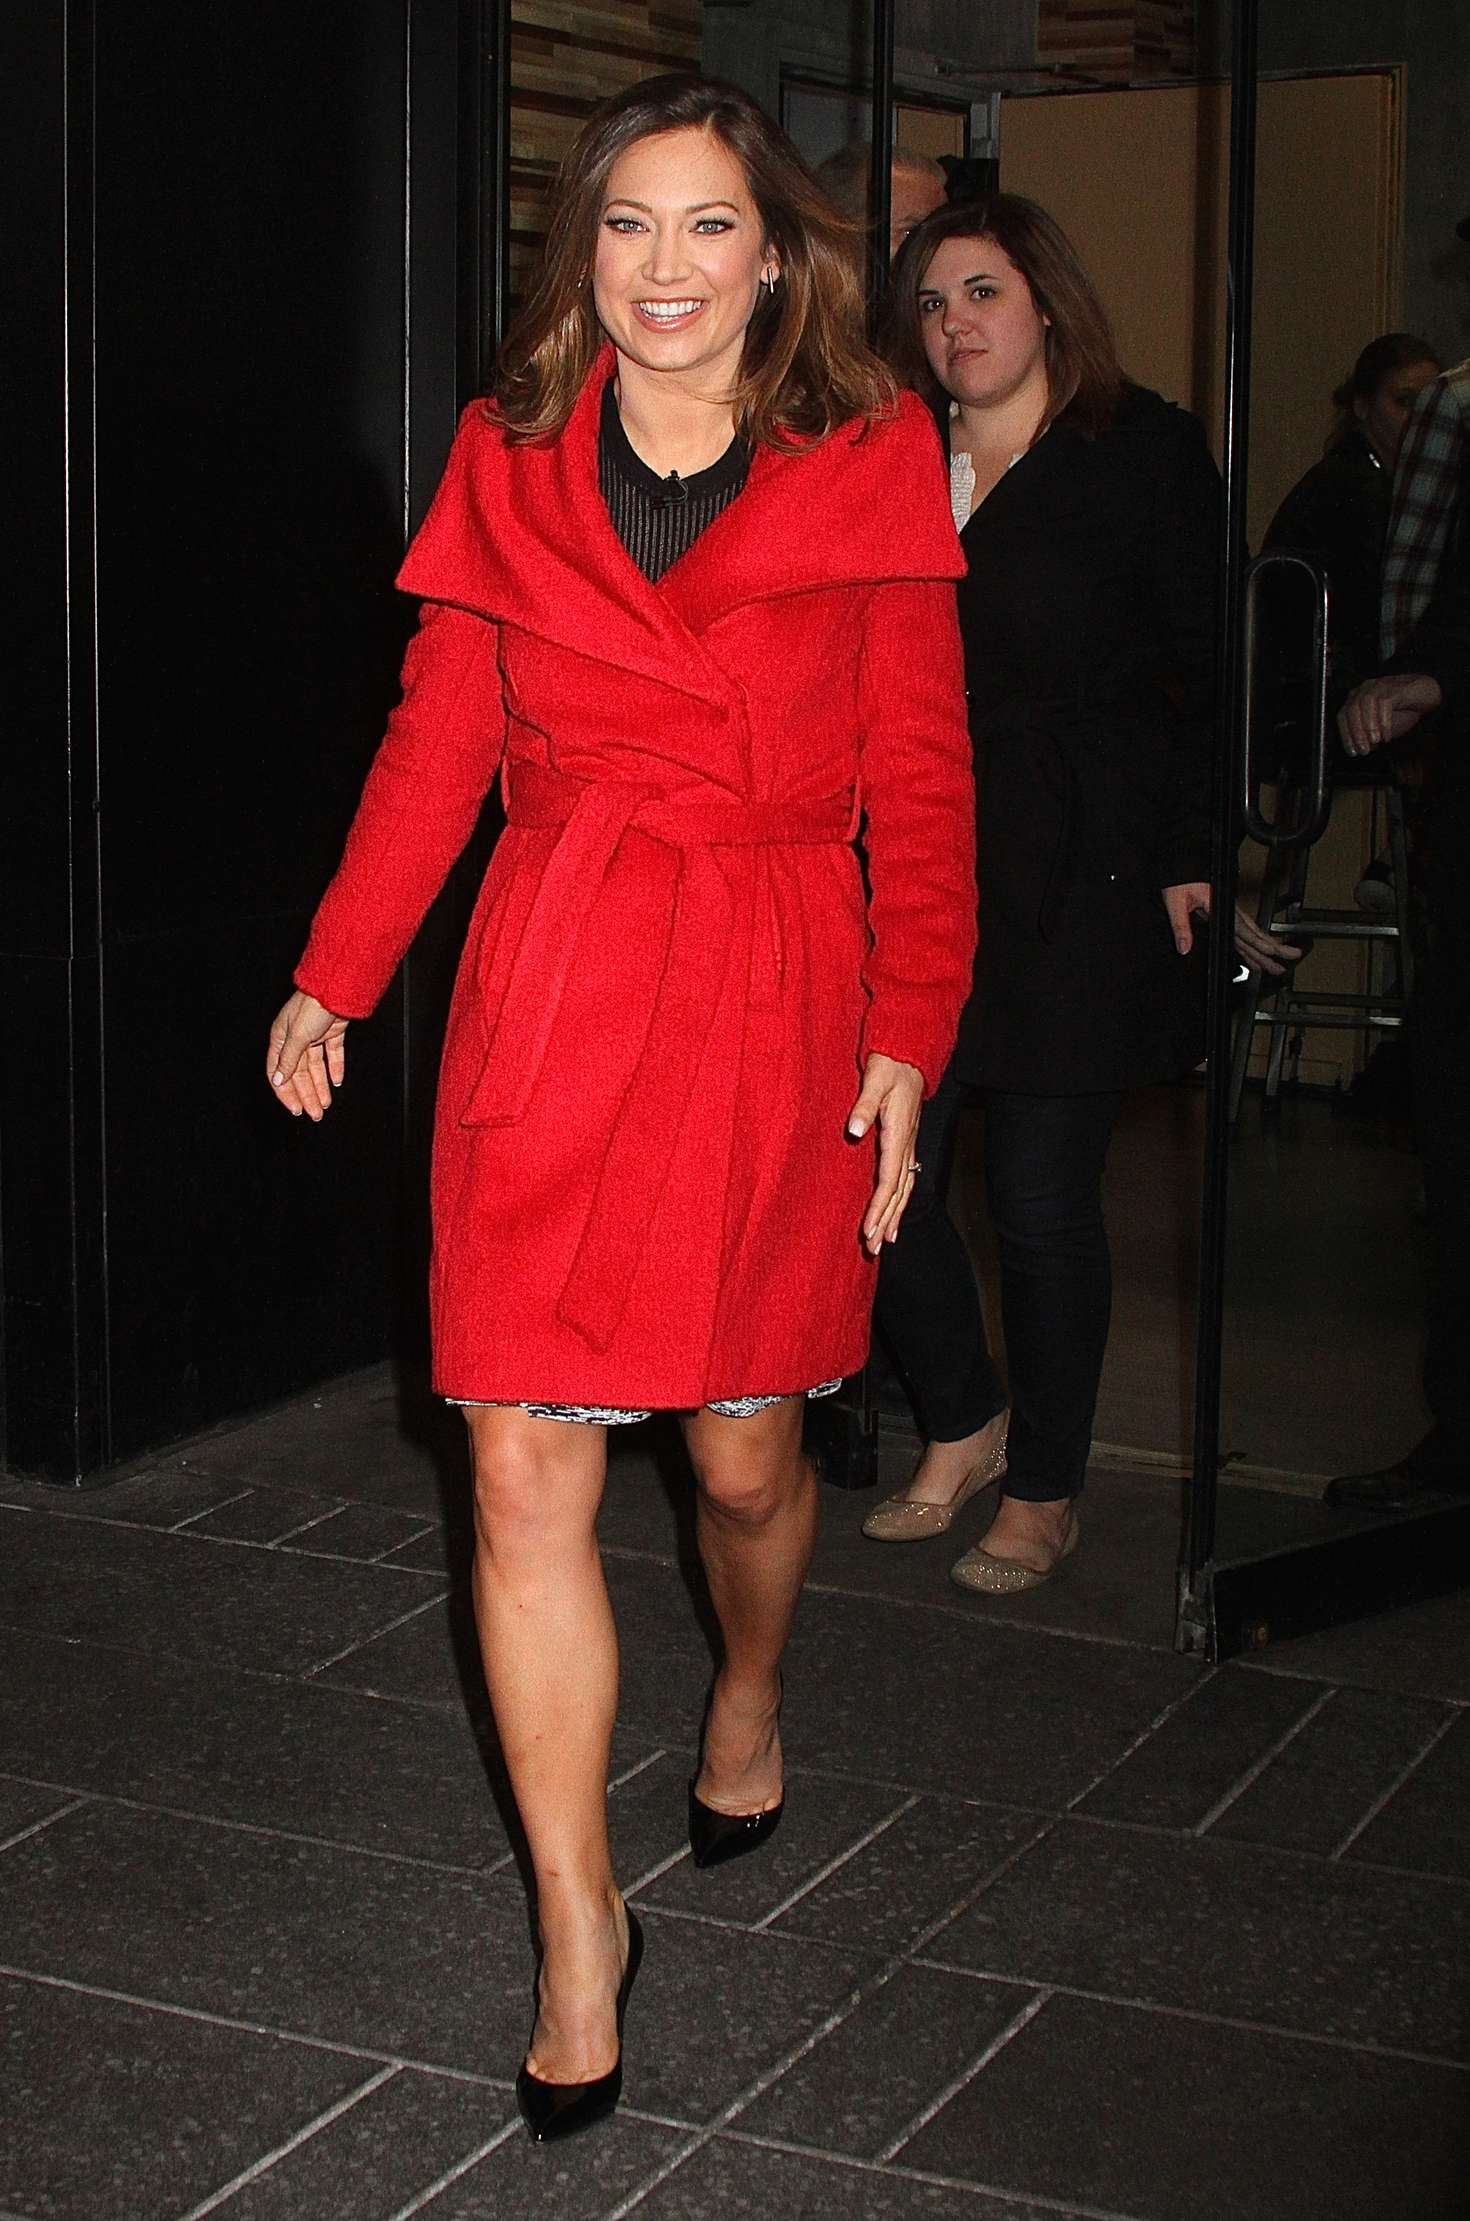 Ginger Zee in Red Coat at Good Morning America in New York